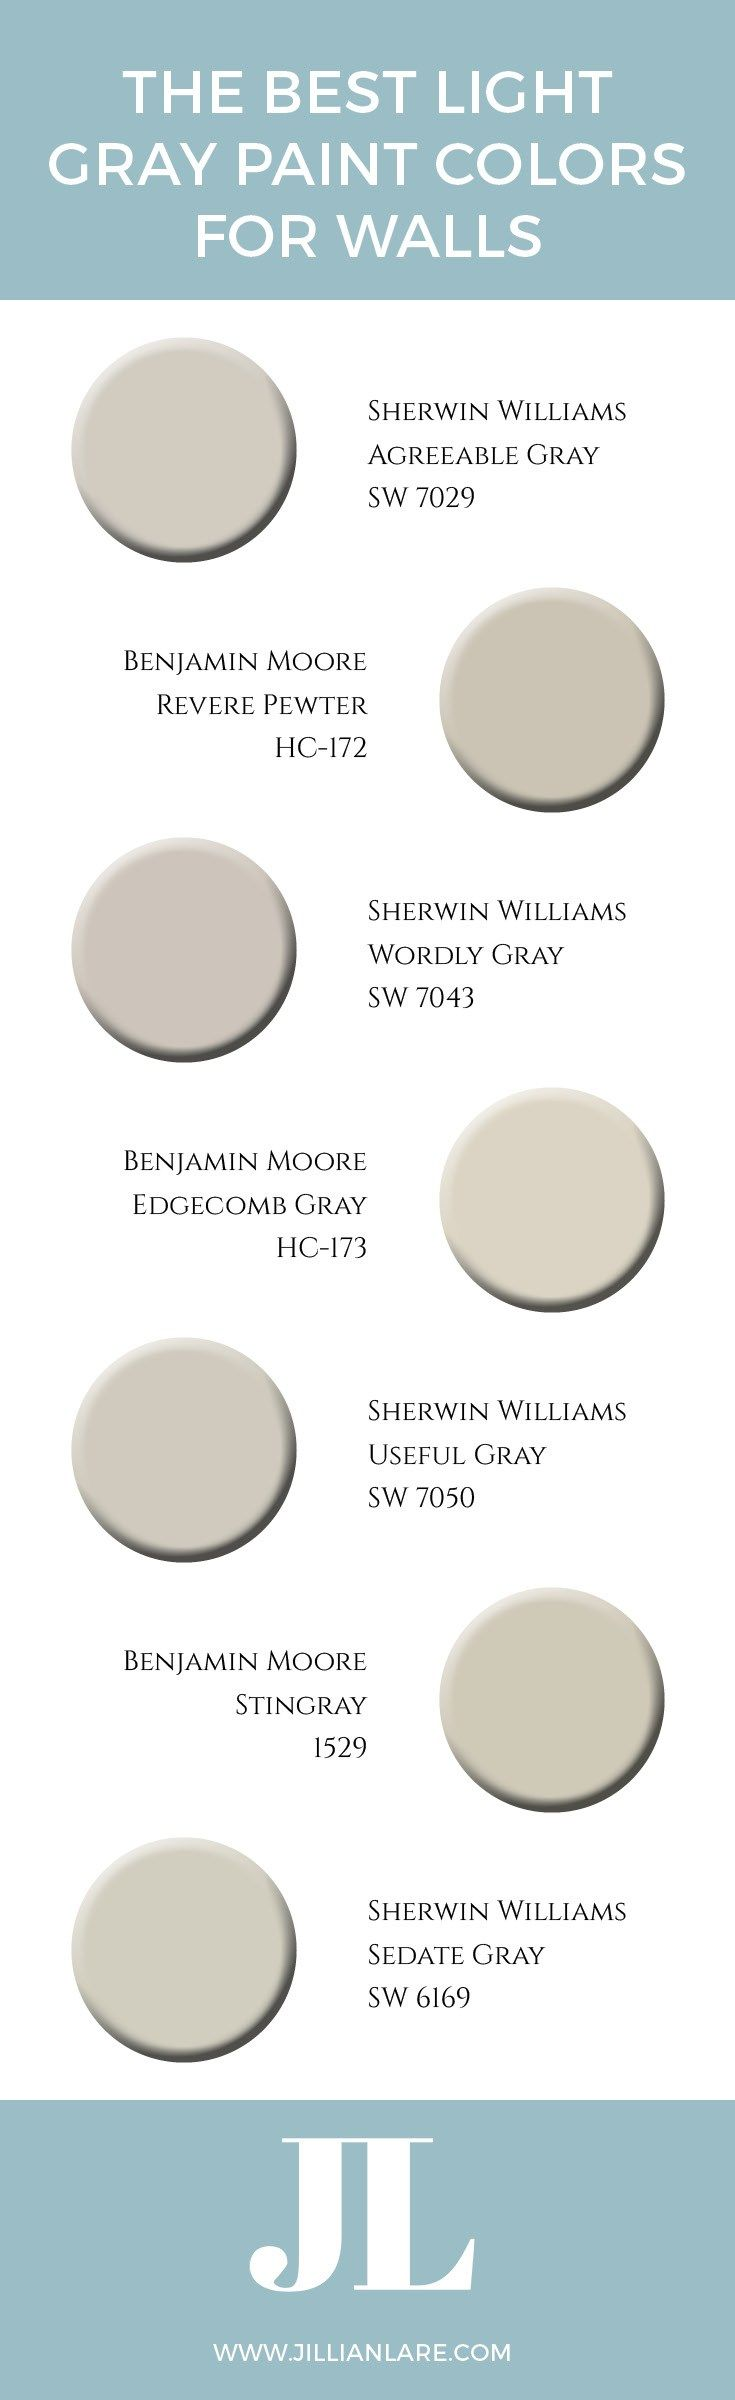 best 25 cabinet paint colors ideas on pinterest kitchen cabinet paint colors painted kitchen. Black Bedroom Furniture Sets. Home Design Ideas